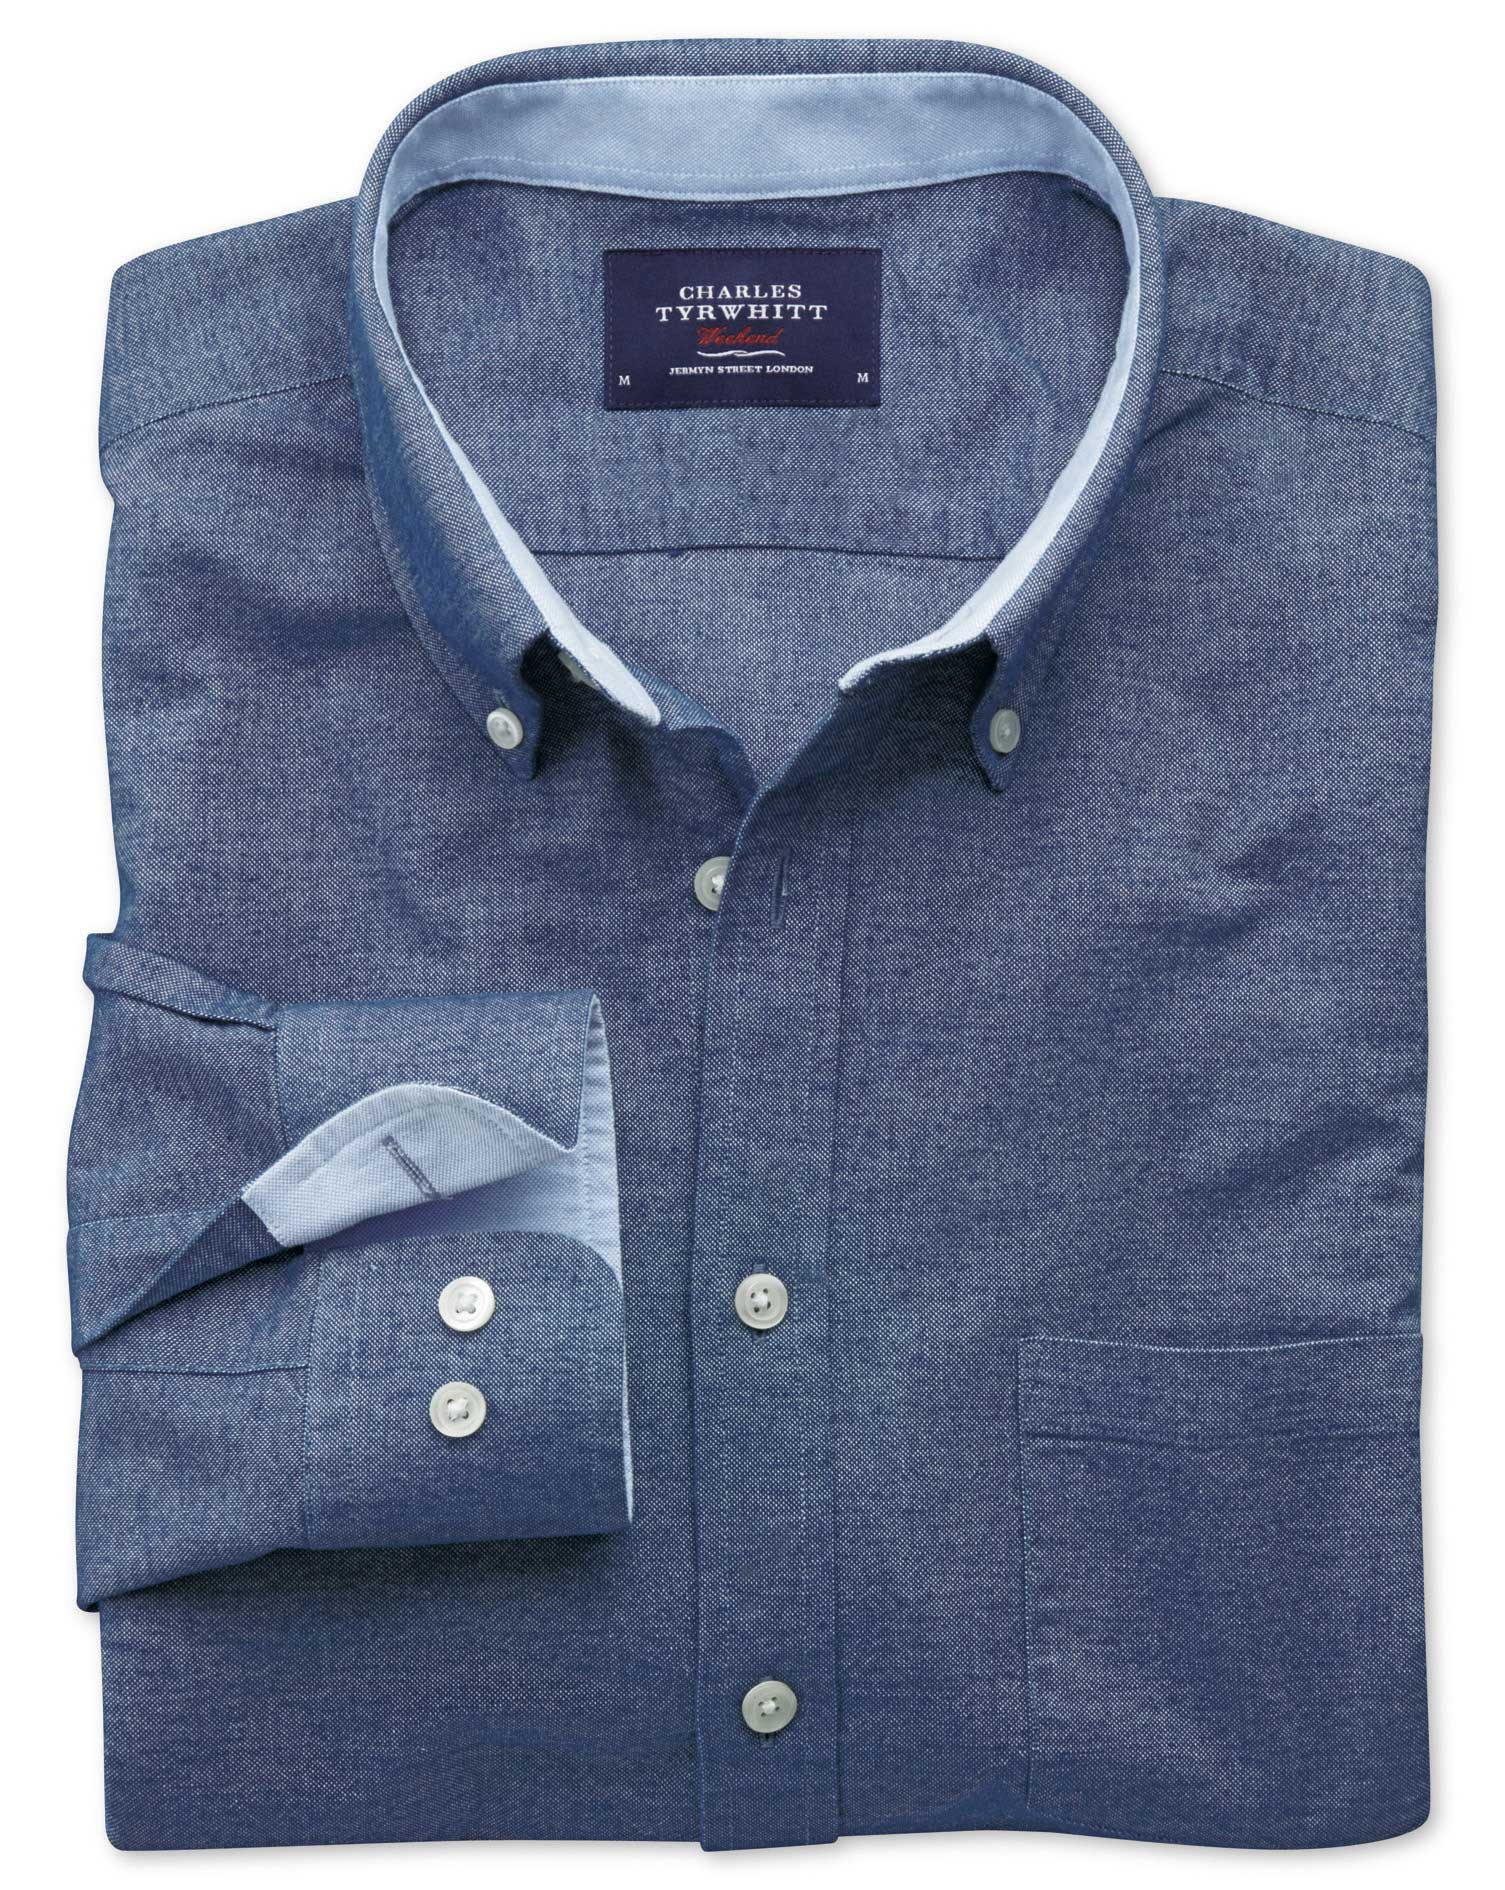 Classic Fit Denim Blue Washed Oxford Shirt Charles Tyrwhitt